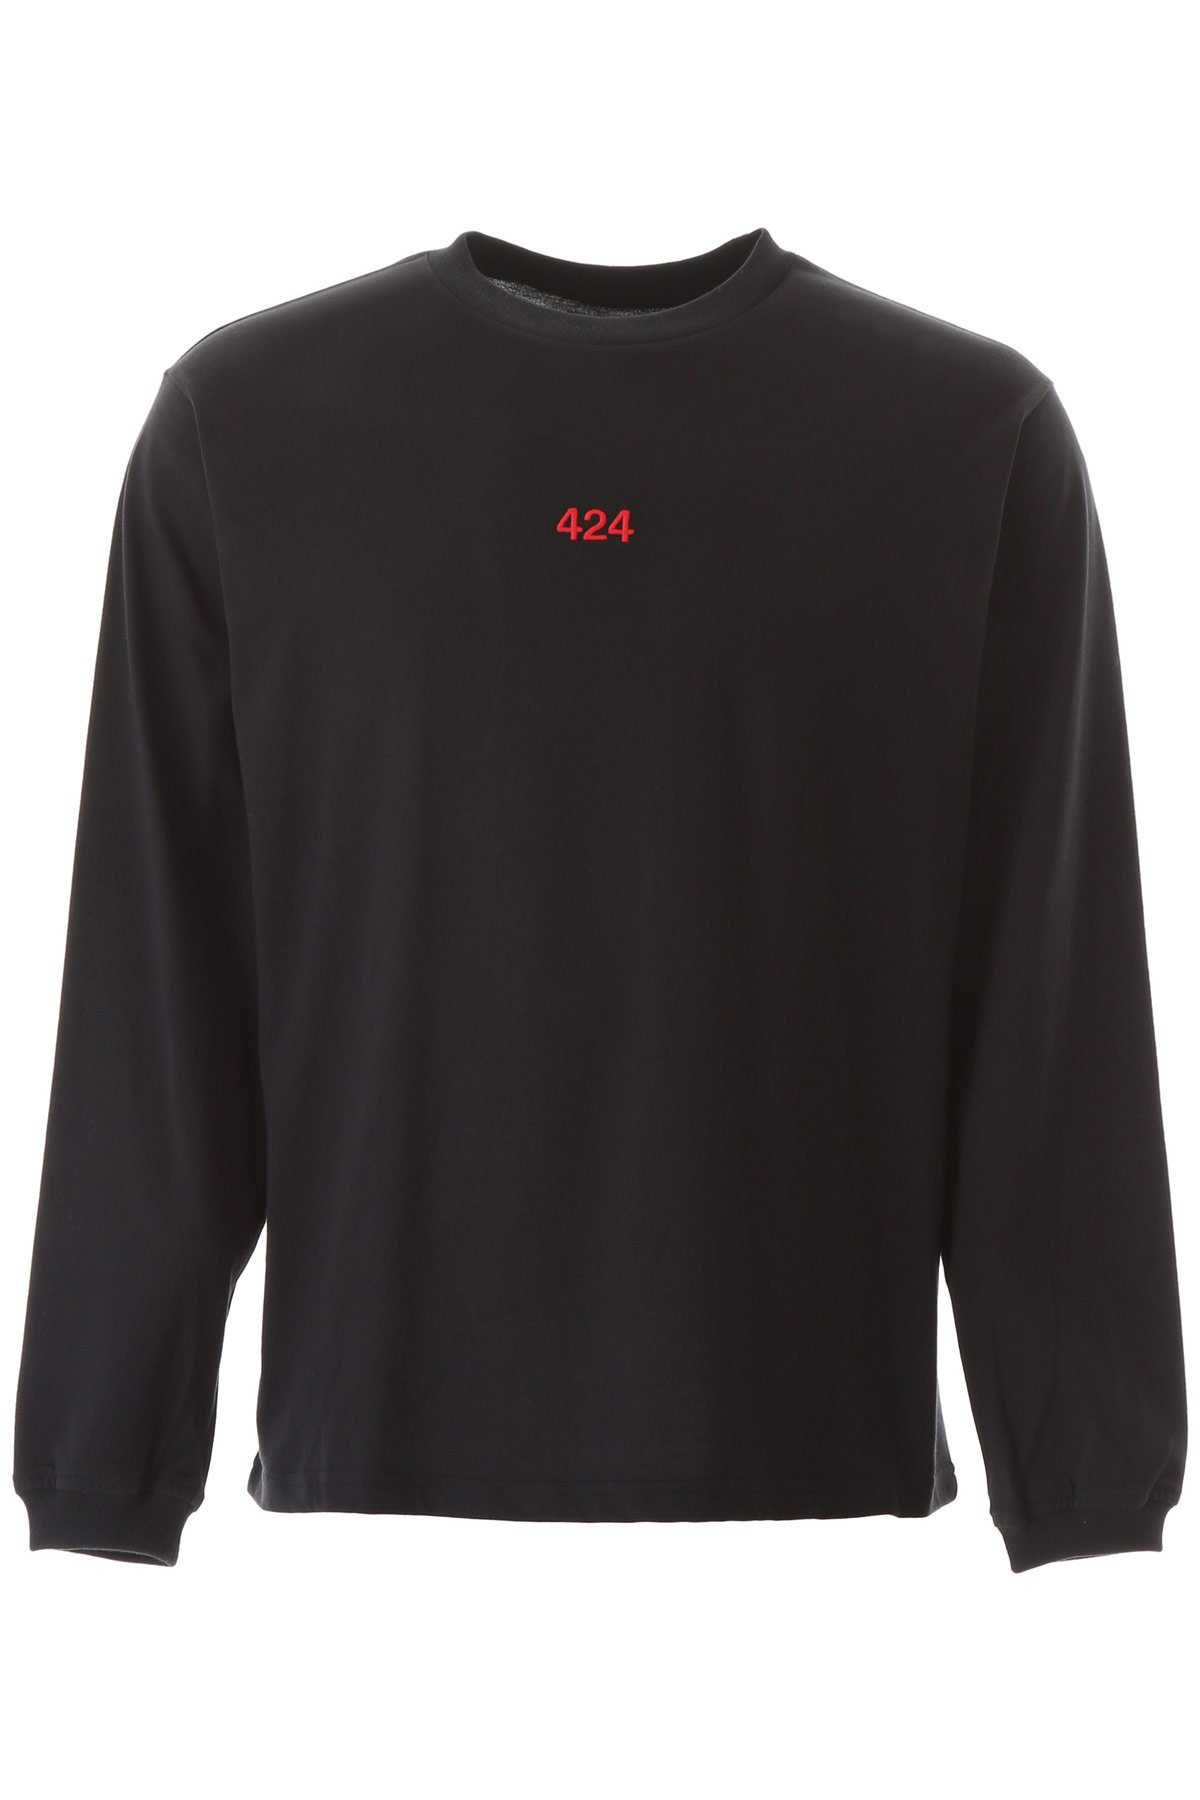 424 t-shirt manica lunga 424